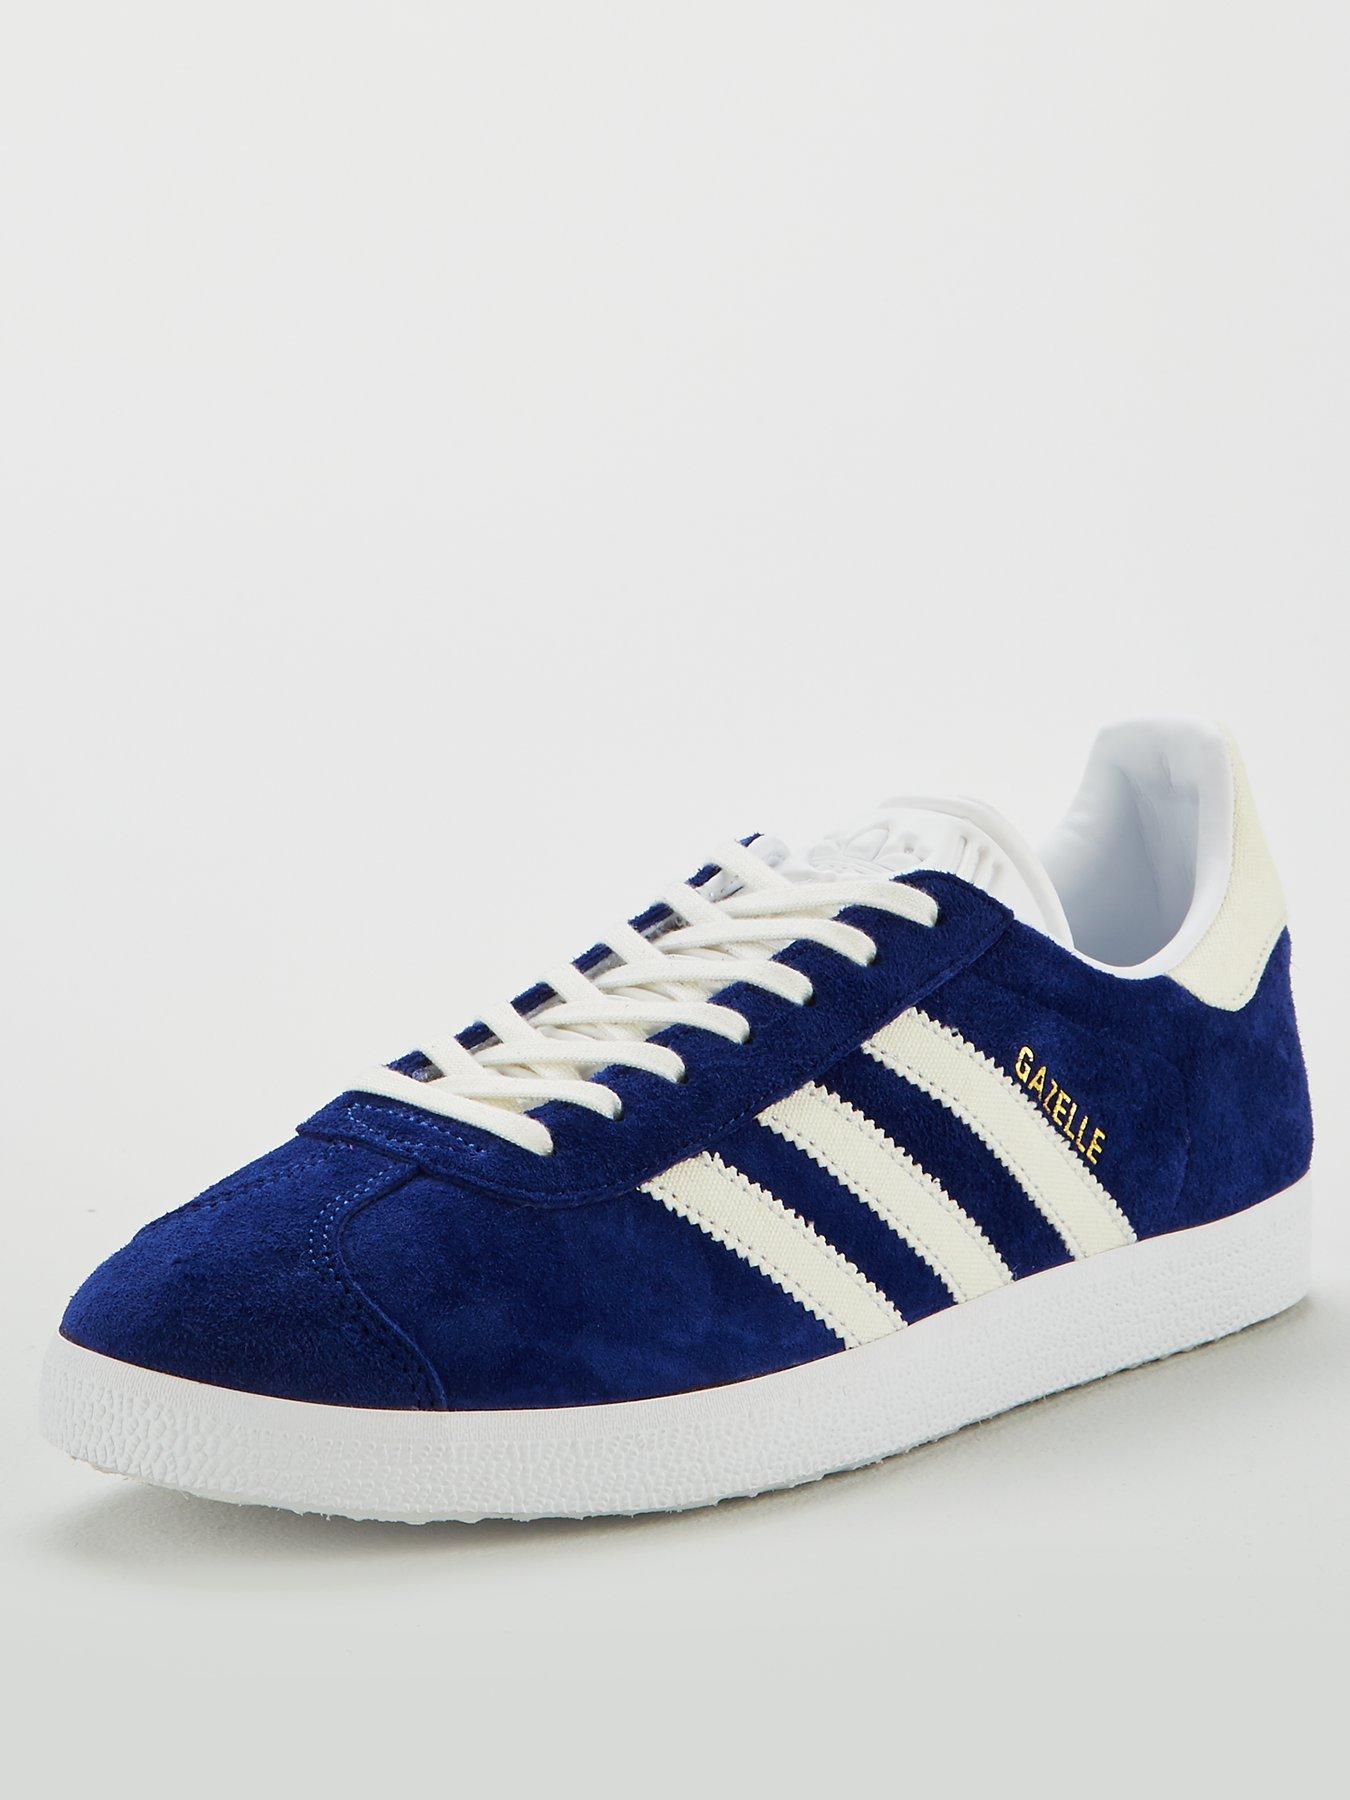 Adidas Ireland Originals Sports | Littlewoods Ireland Adidas Online aca898